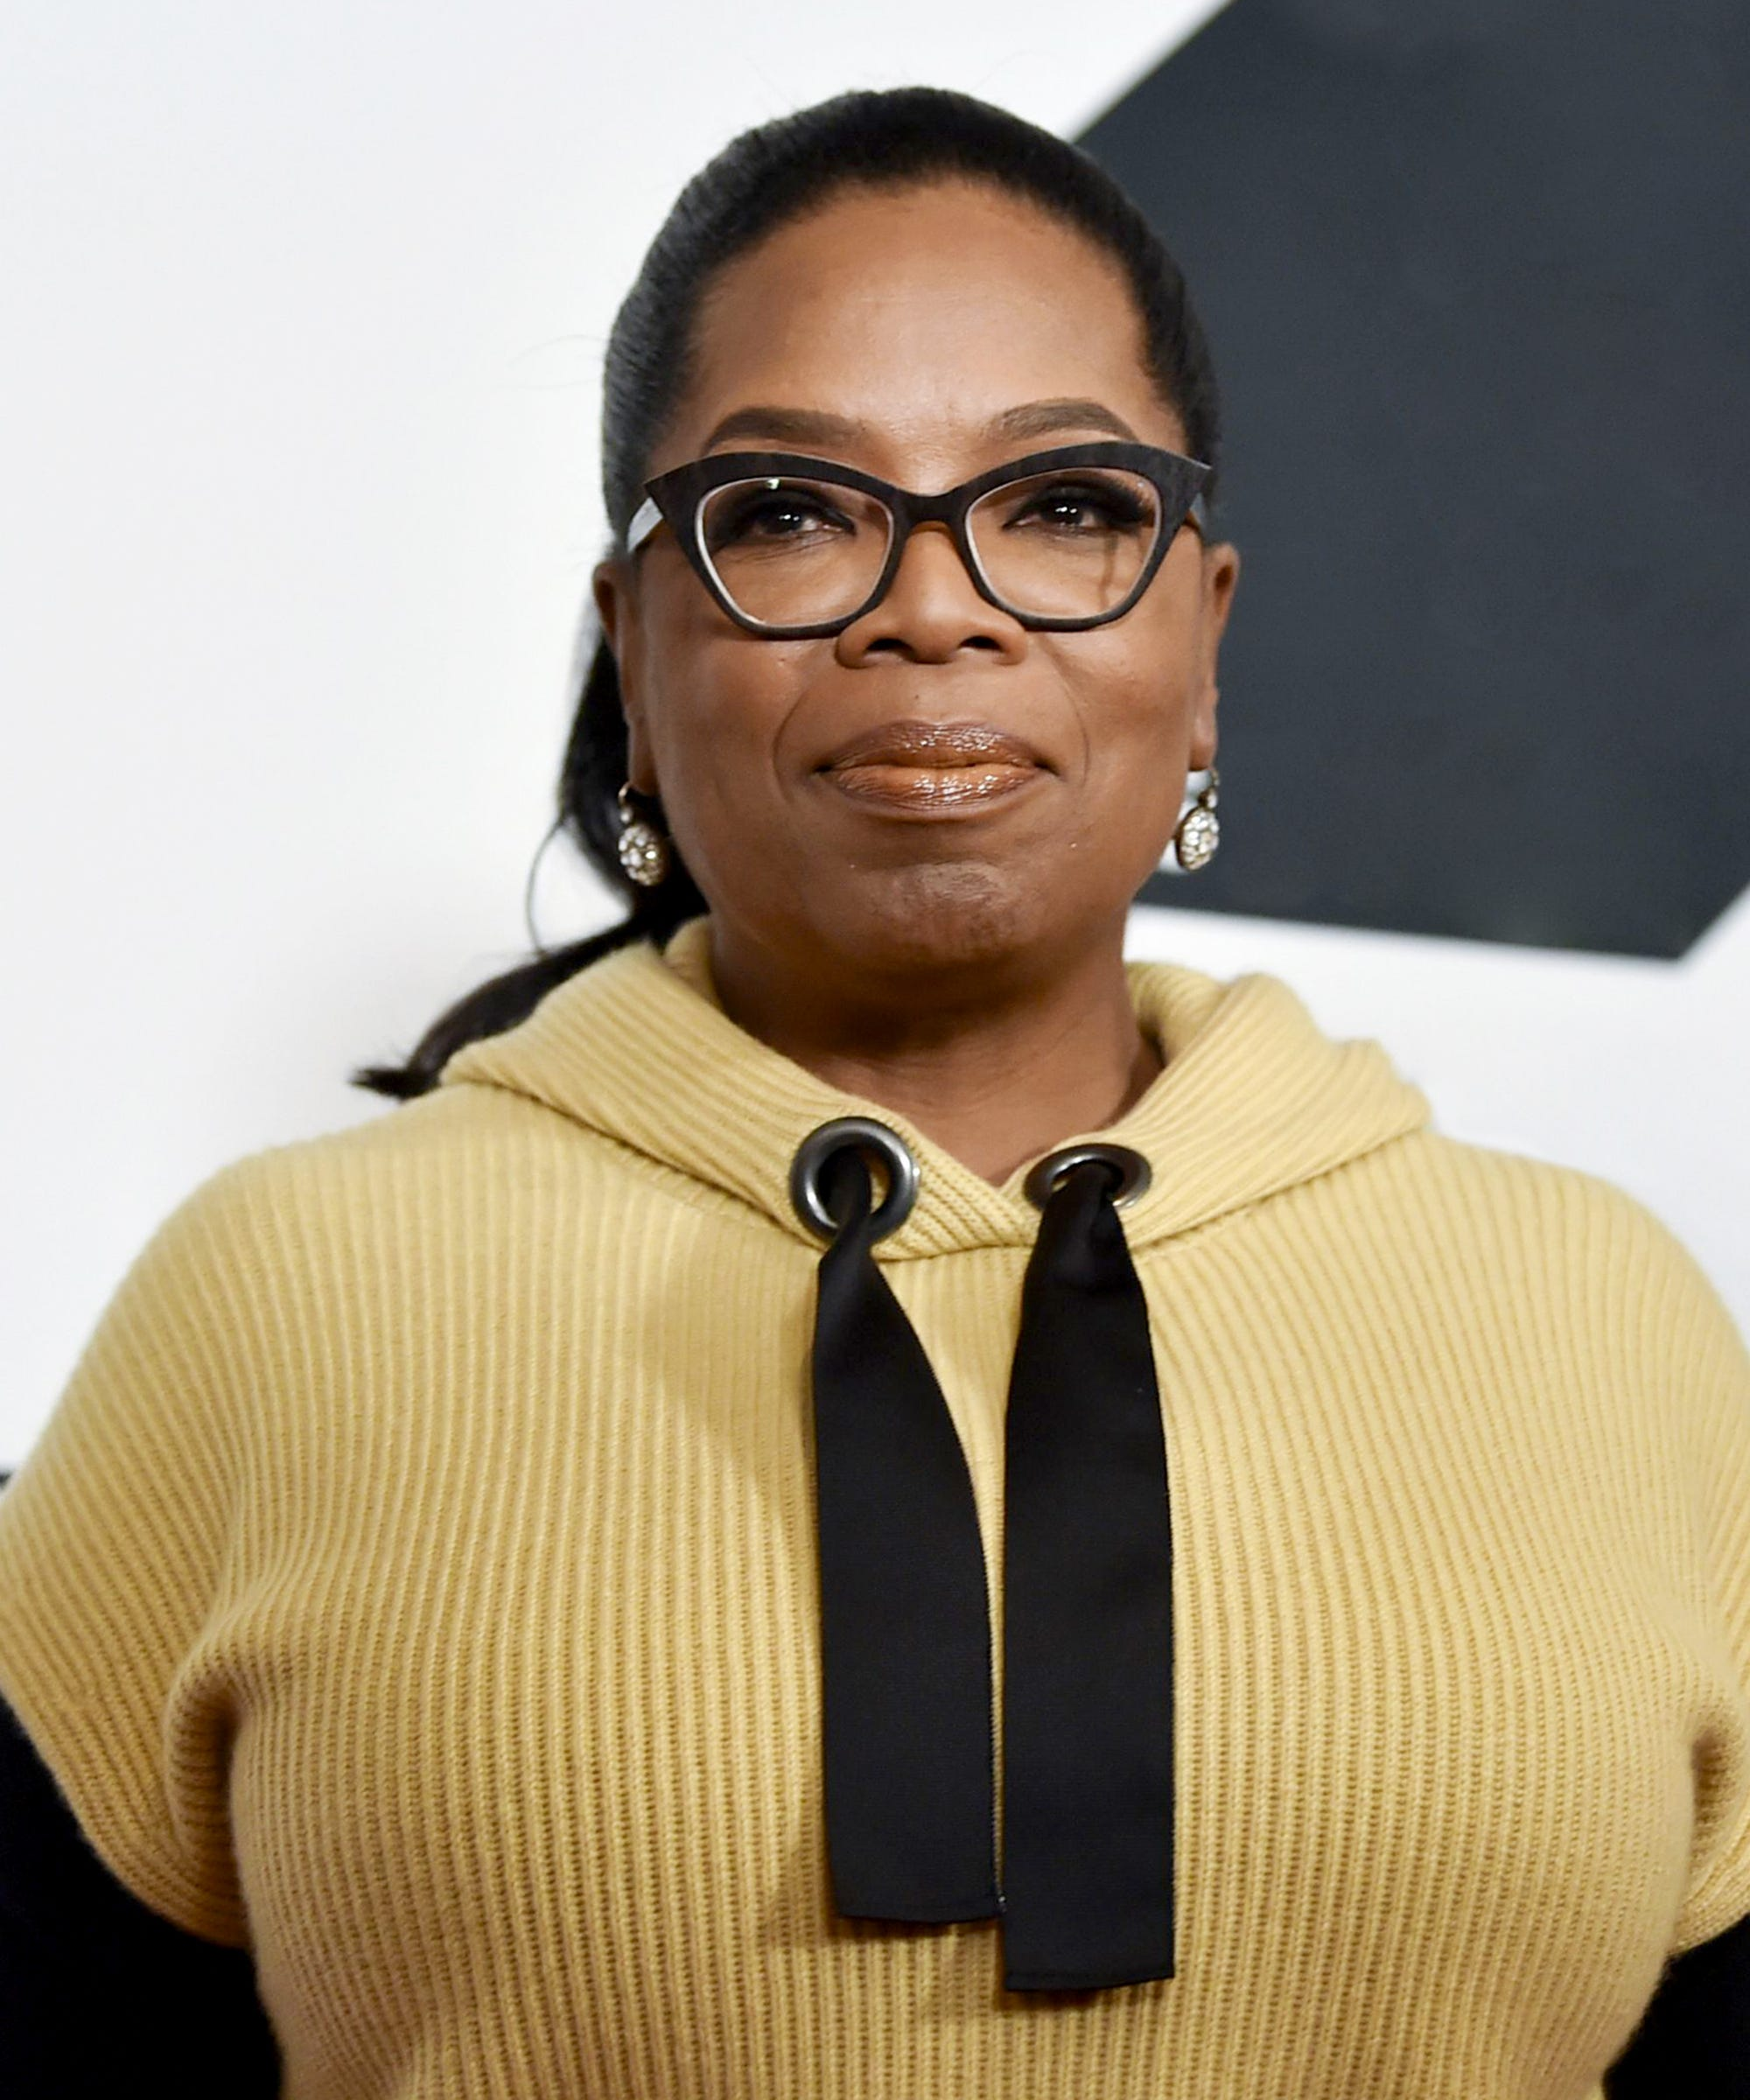 photo Oprah upskirt winfrey hot naked pics